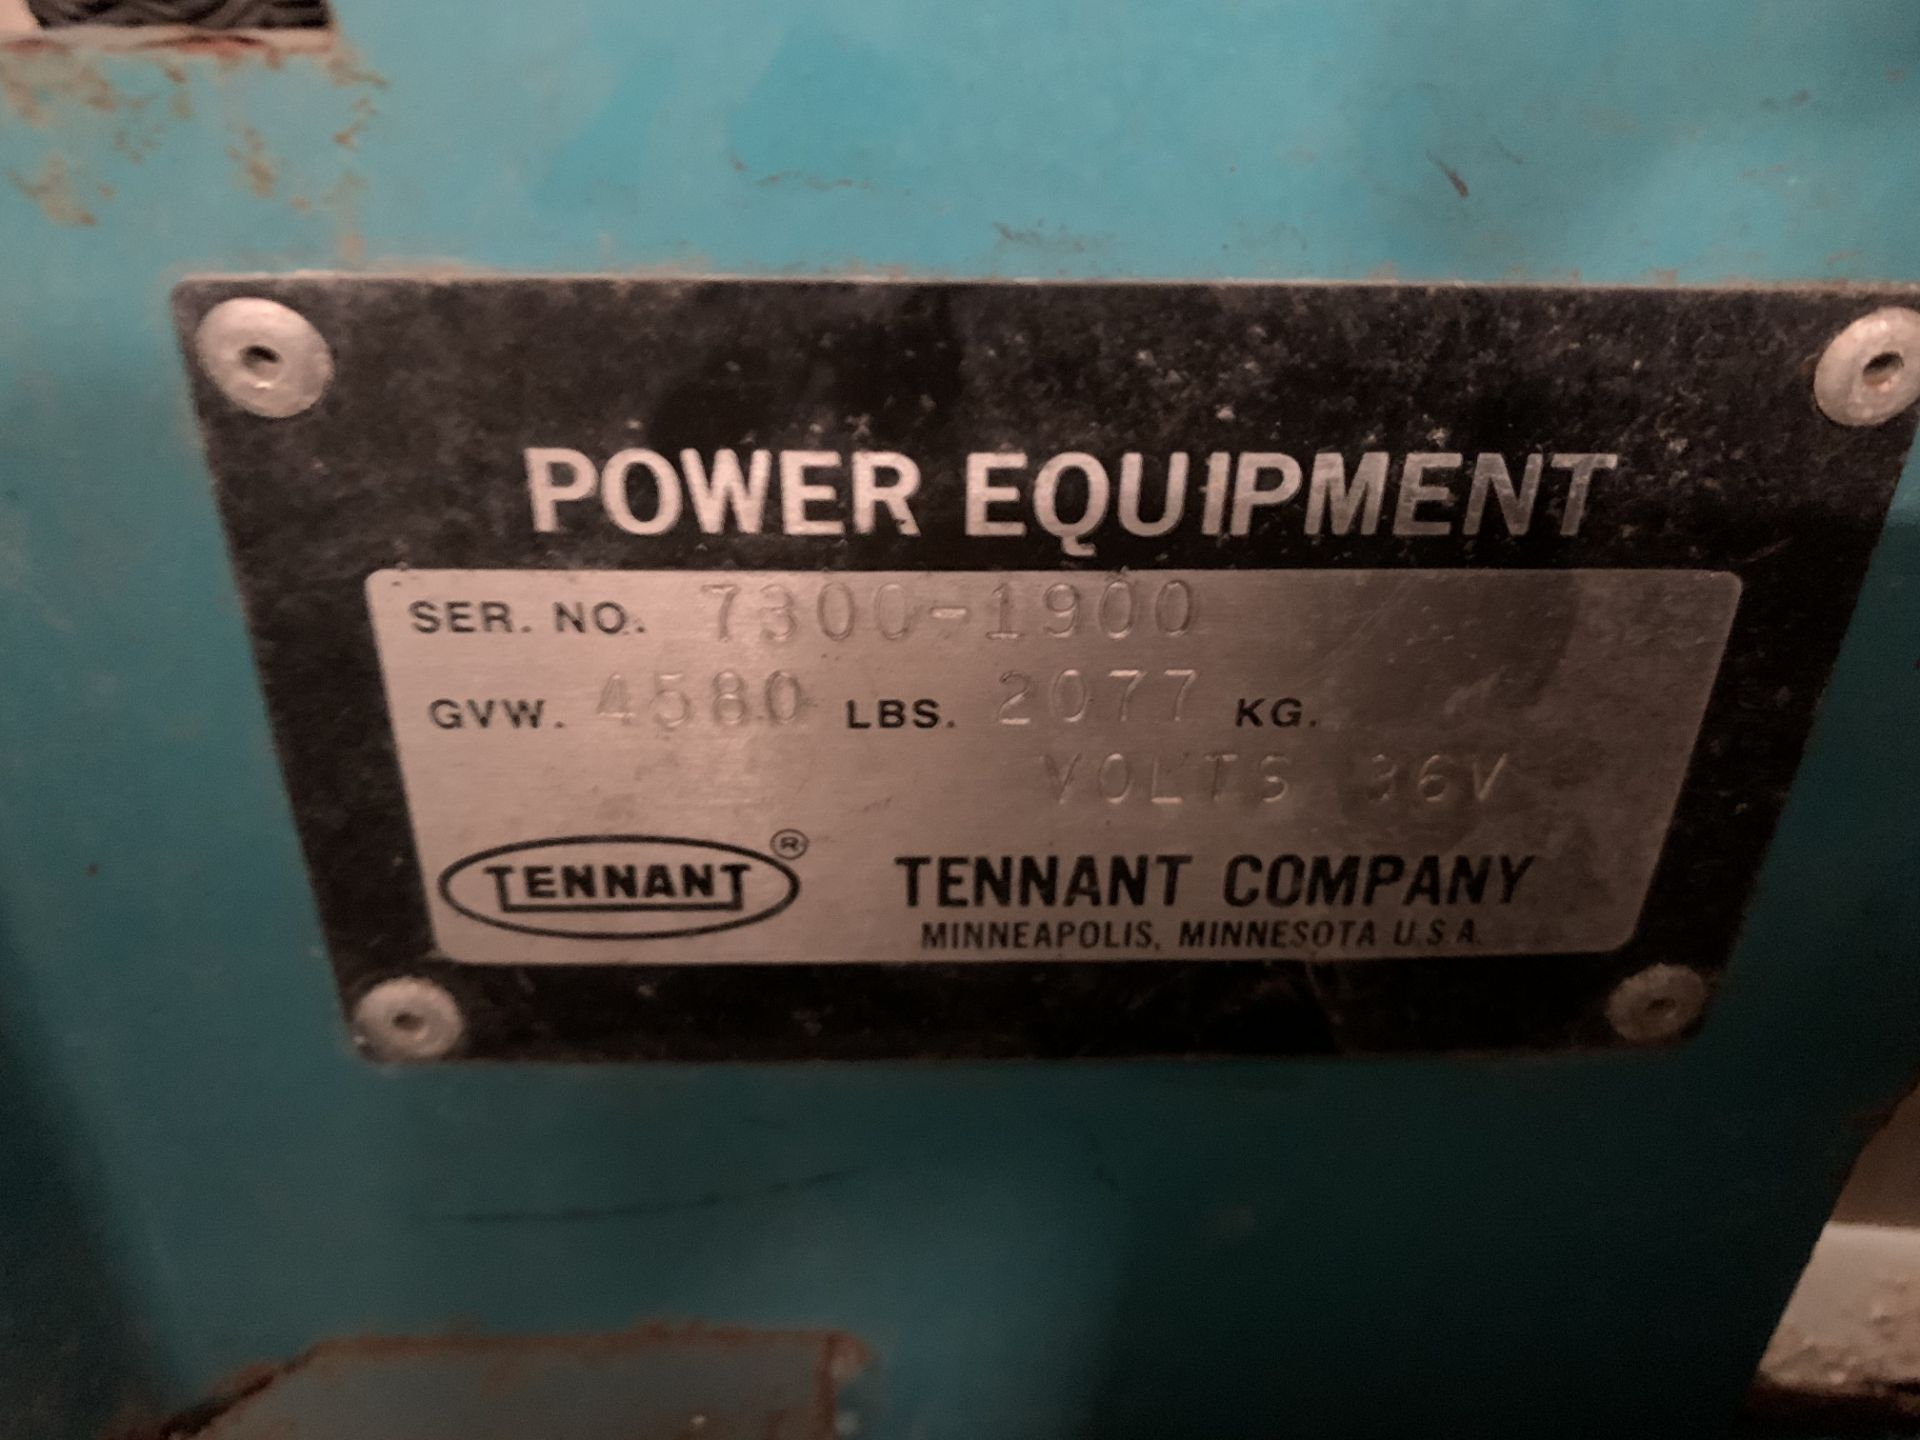 Lot 28B - TENNANT FLOOR SCRUBBER, MODEL: 7300, S/N: 7300-1900, 36 VOLTS, GVWT: 4,580, 1,297 HOURS